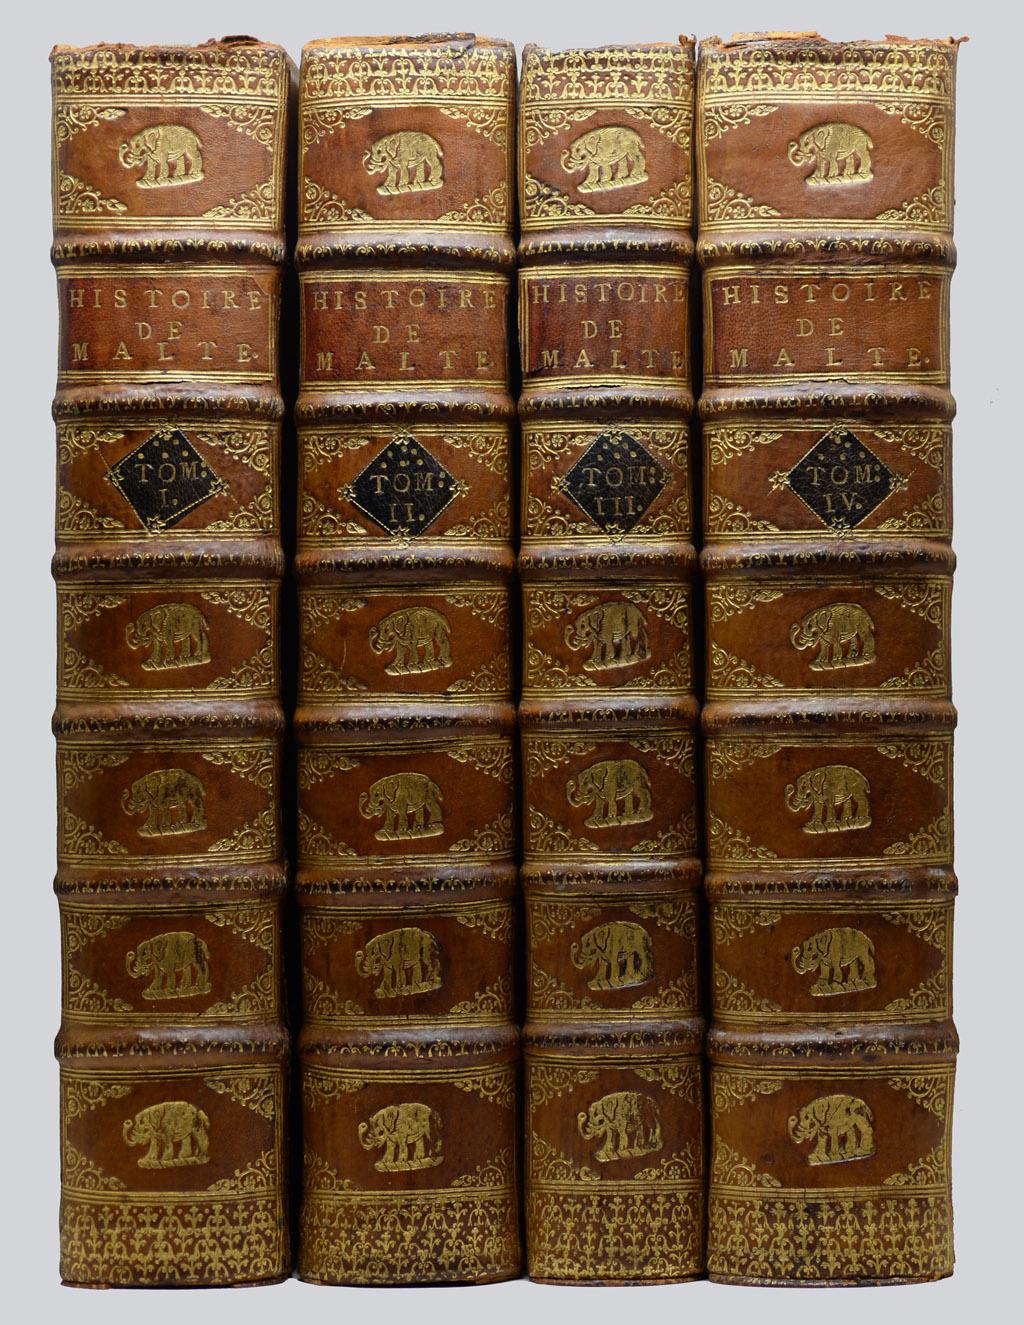 Histoire des Chevaliers de Malte, 1726.